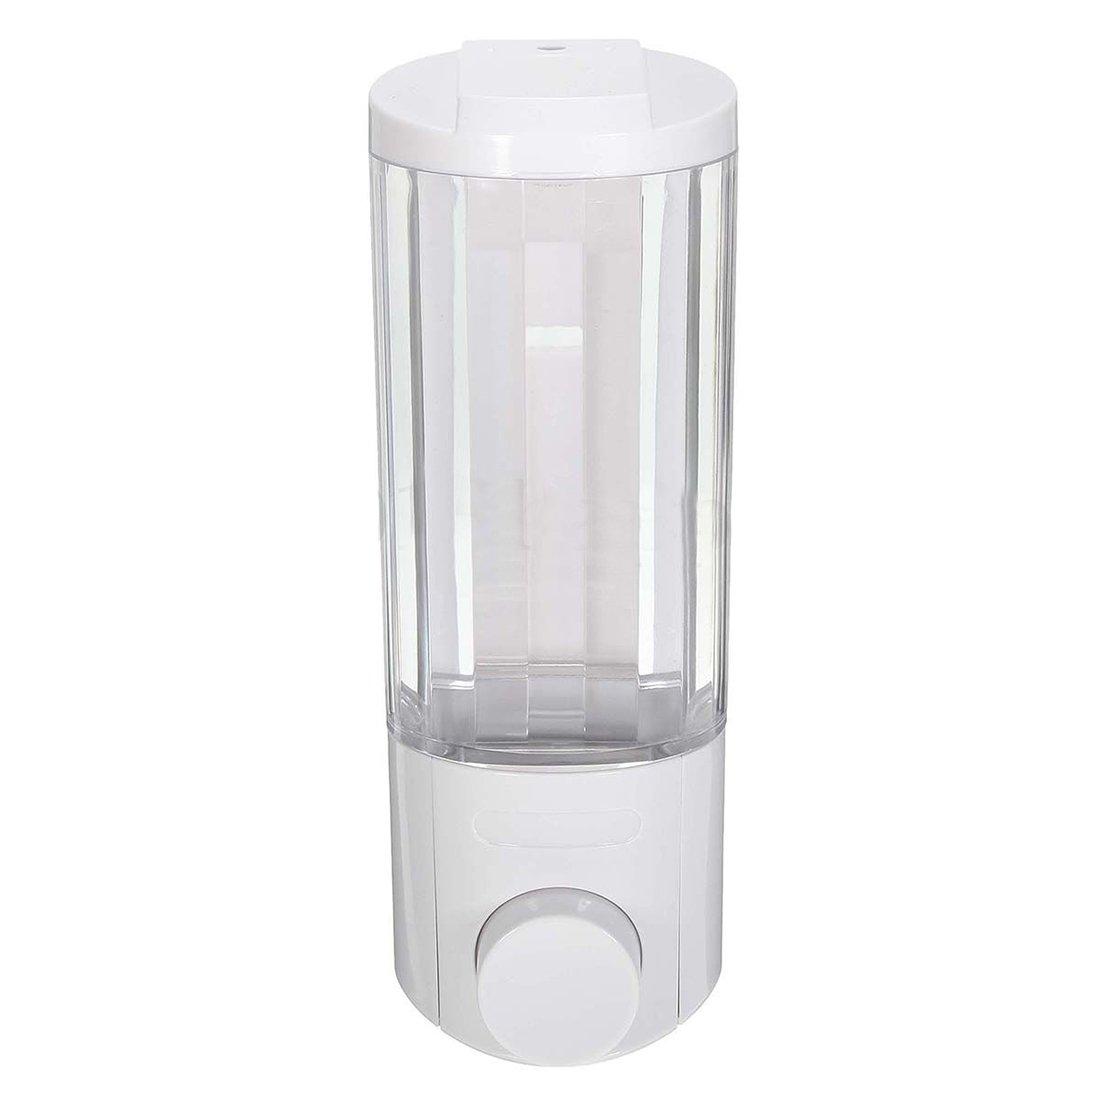 SODIAL Liquid Soap Dispenser Wall Mounted Bathroom Hand Sanitizer Shower Gel Shampoo Titanium white